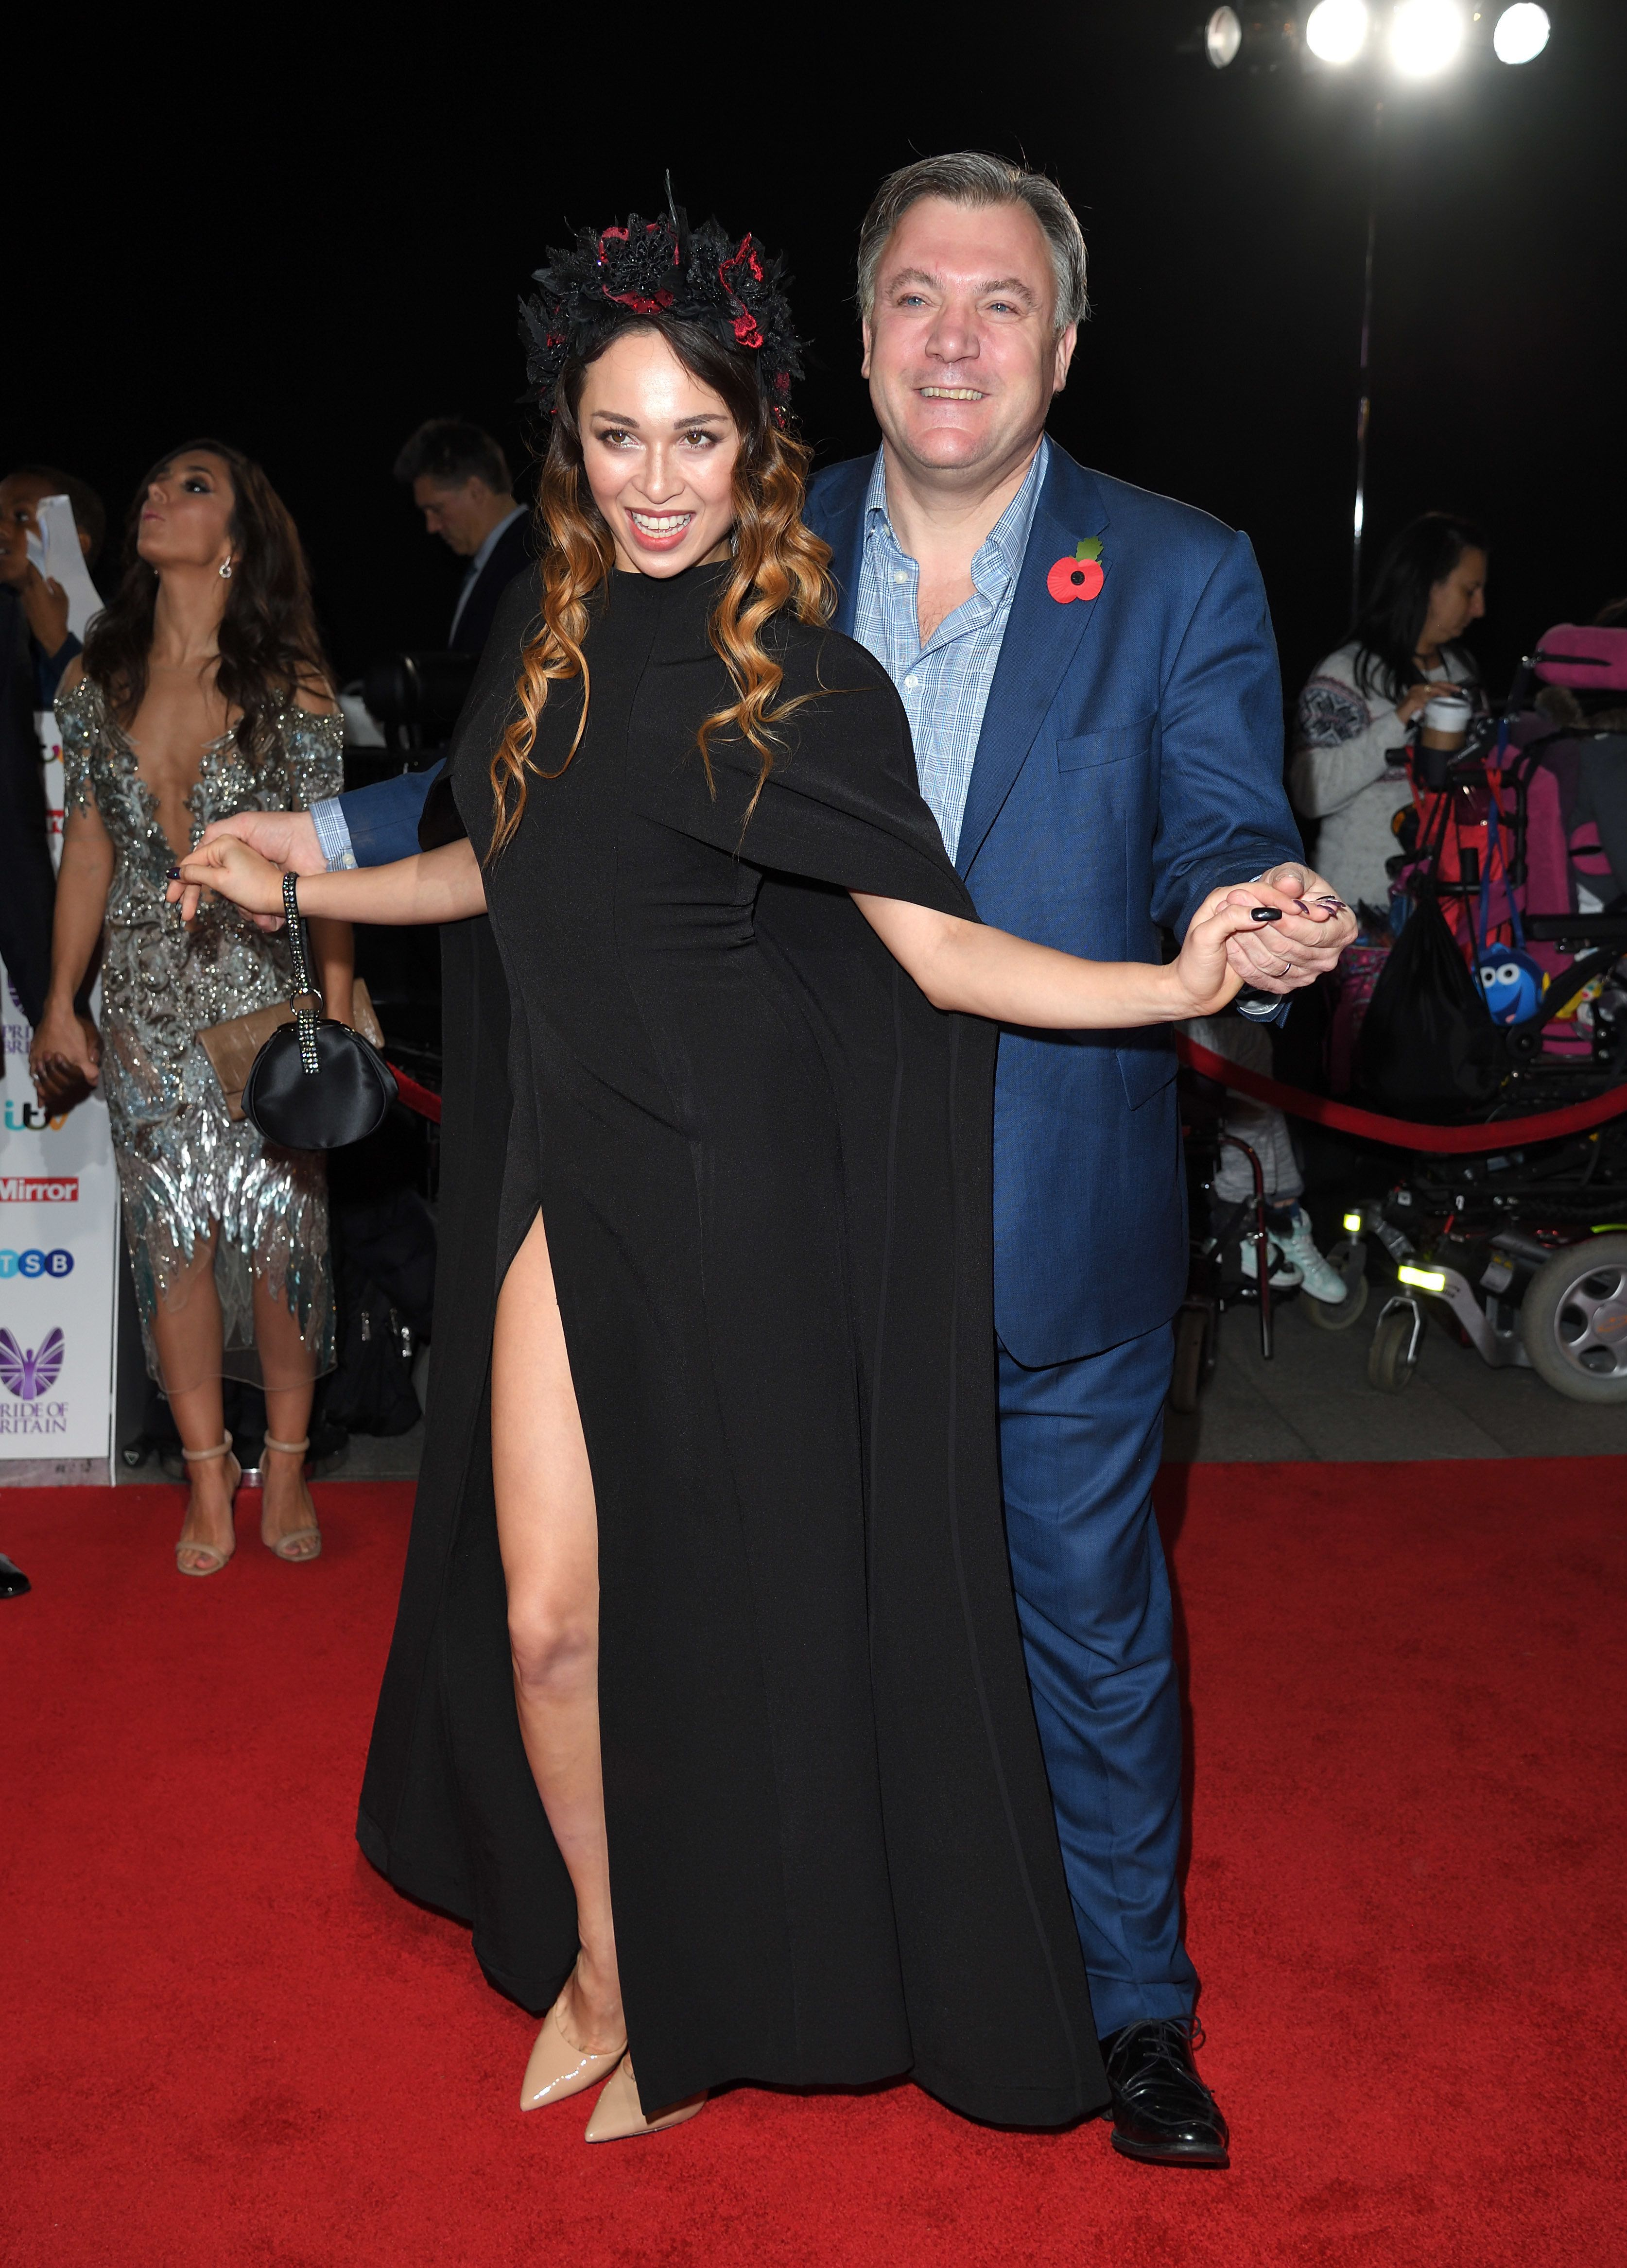 Ed Balls And Katya Jones Perform 'Gangnam Style' Dance Again Because Why